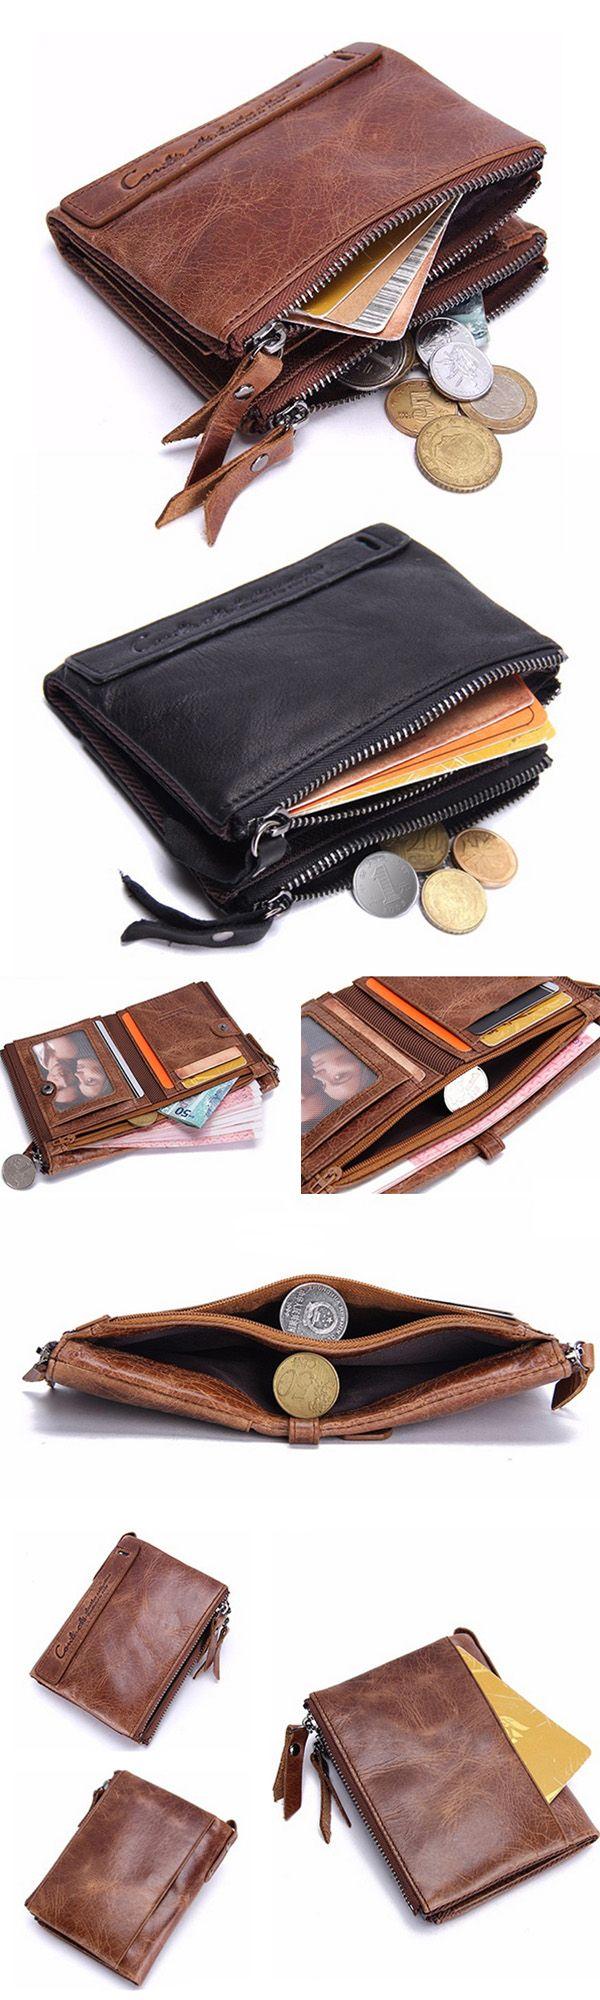 Men Genuine Leather Zipper Short Wallet Folding Totes Card Holders Bags